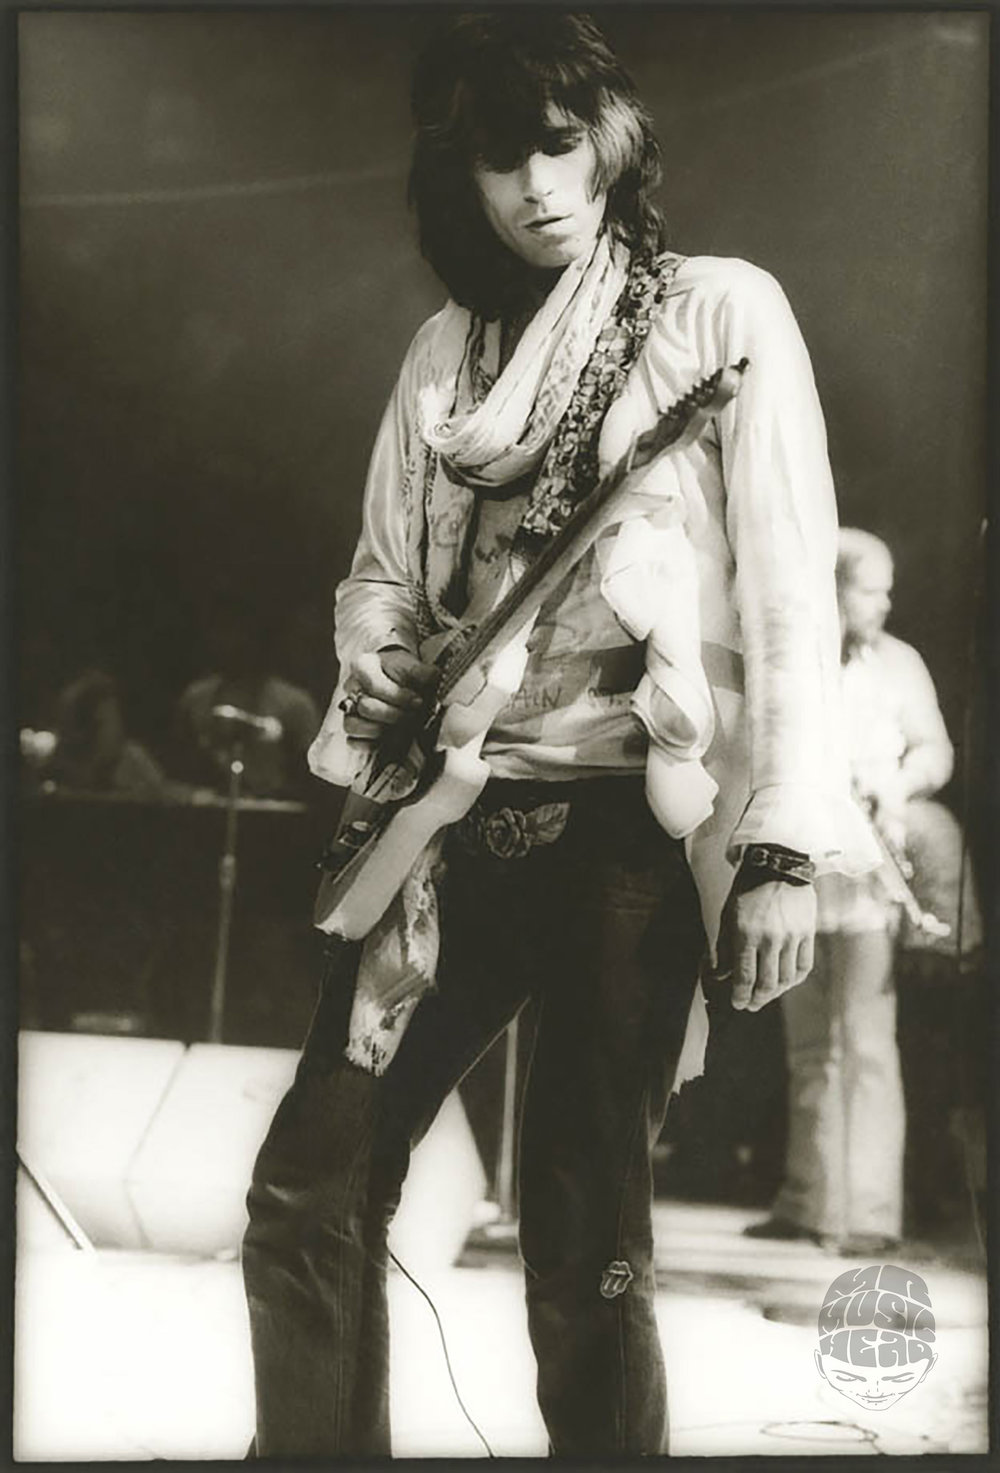 neil zlozower_ROLLING STONES_keith richards_LIVE 1972.jpg